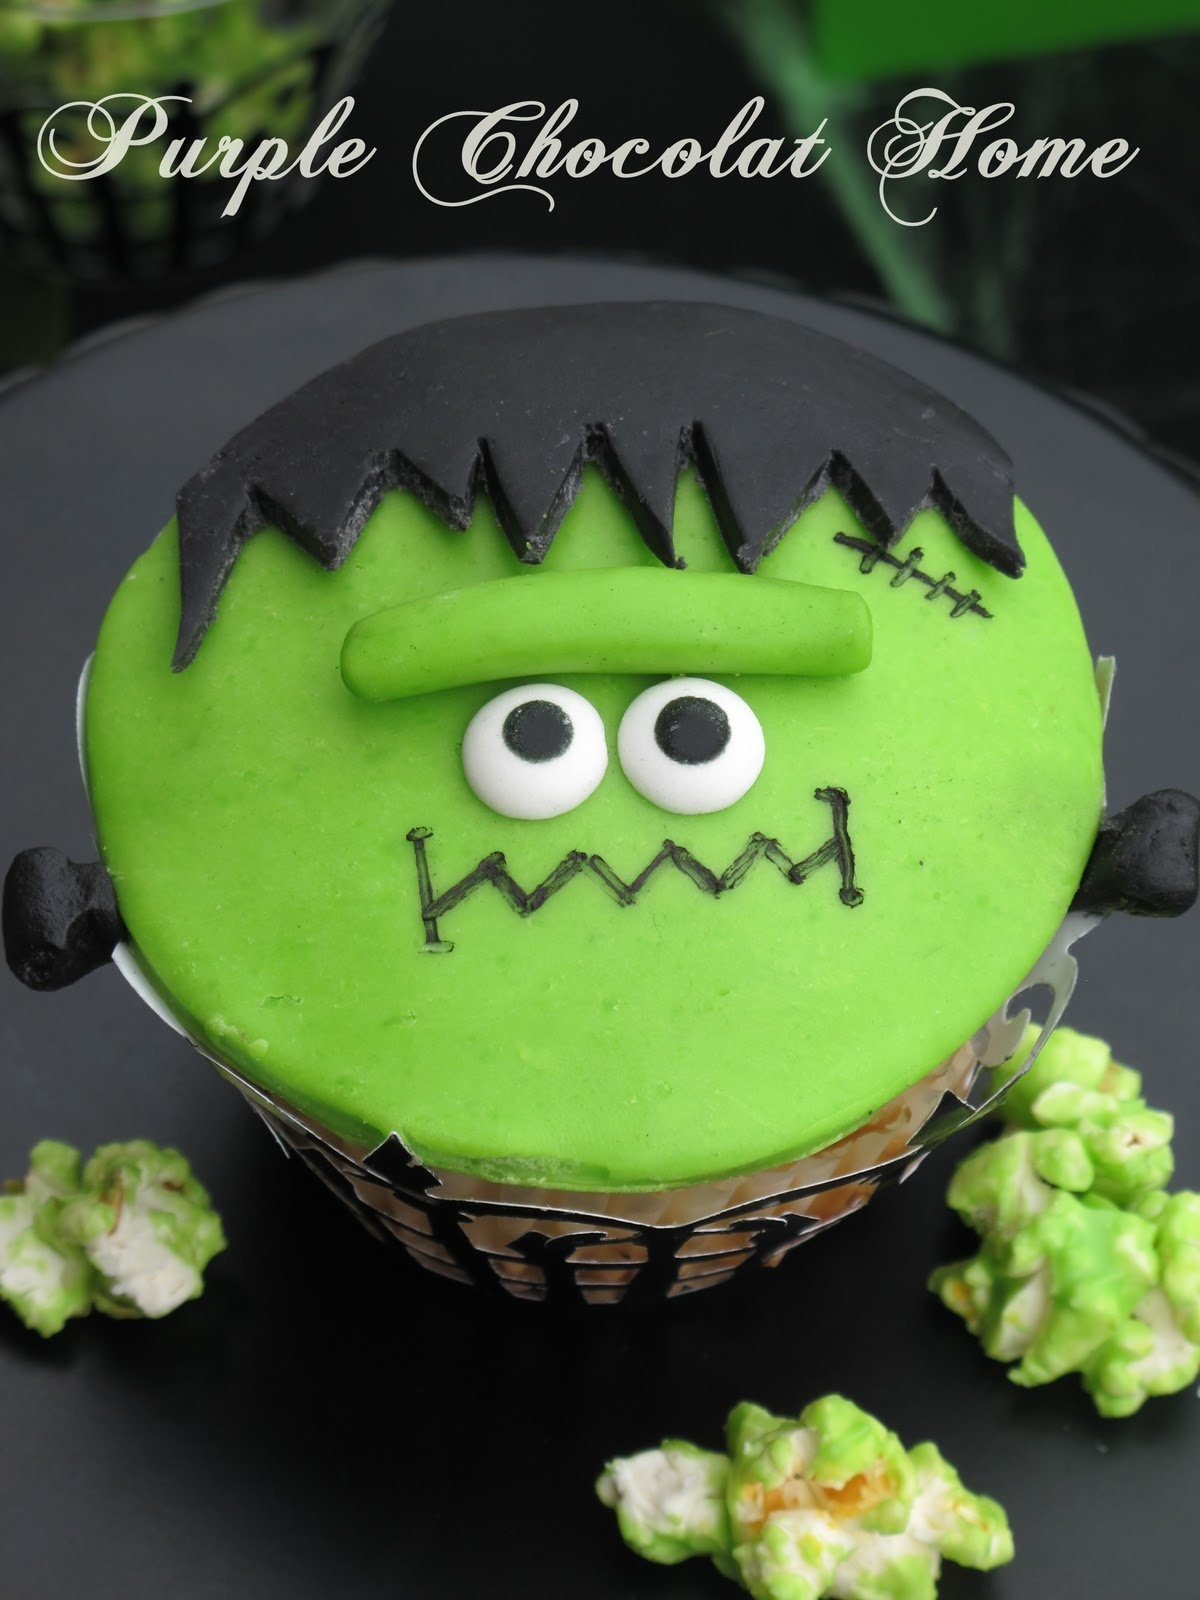 Little Cakes Cupcake Kitchen Facebook